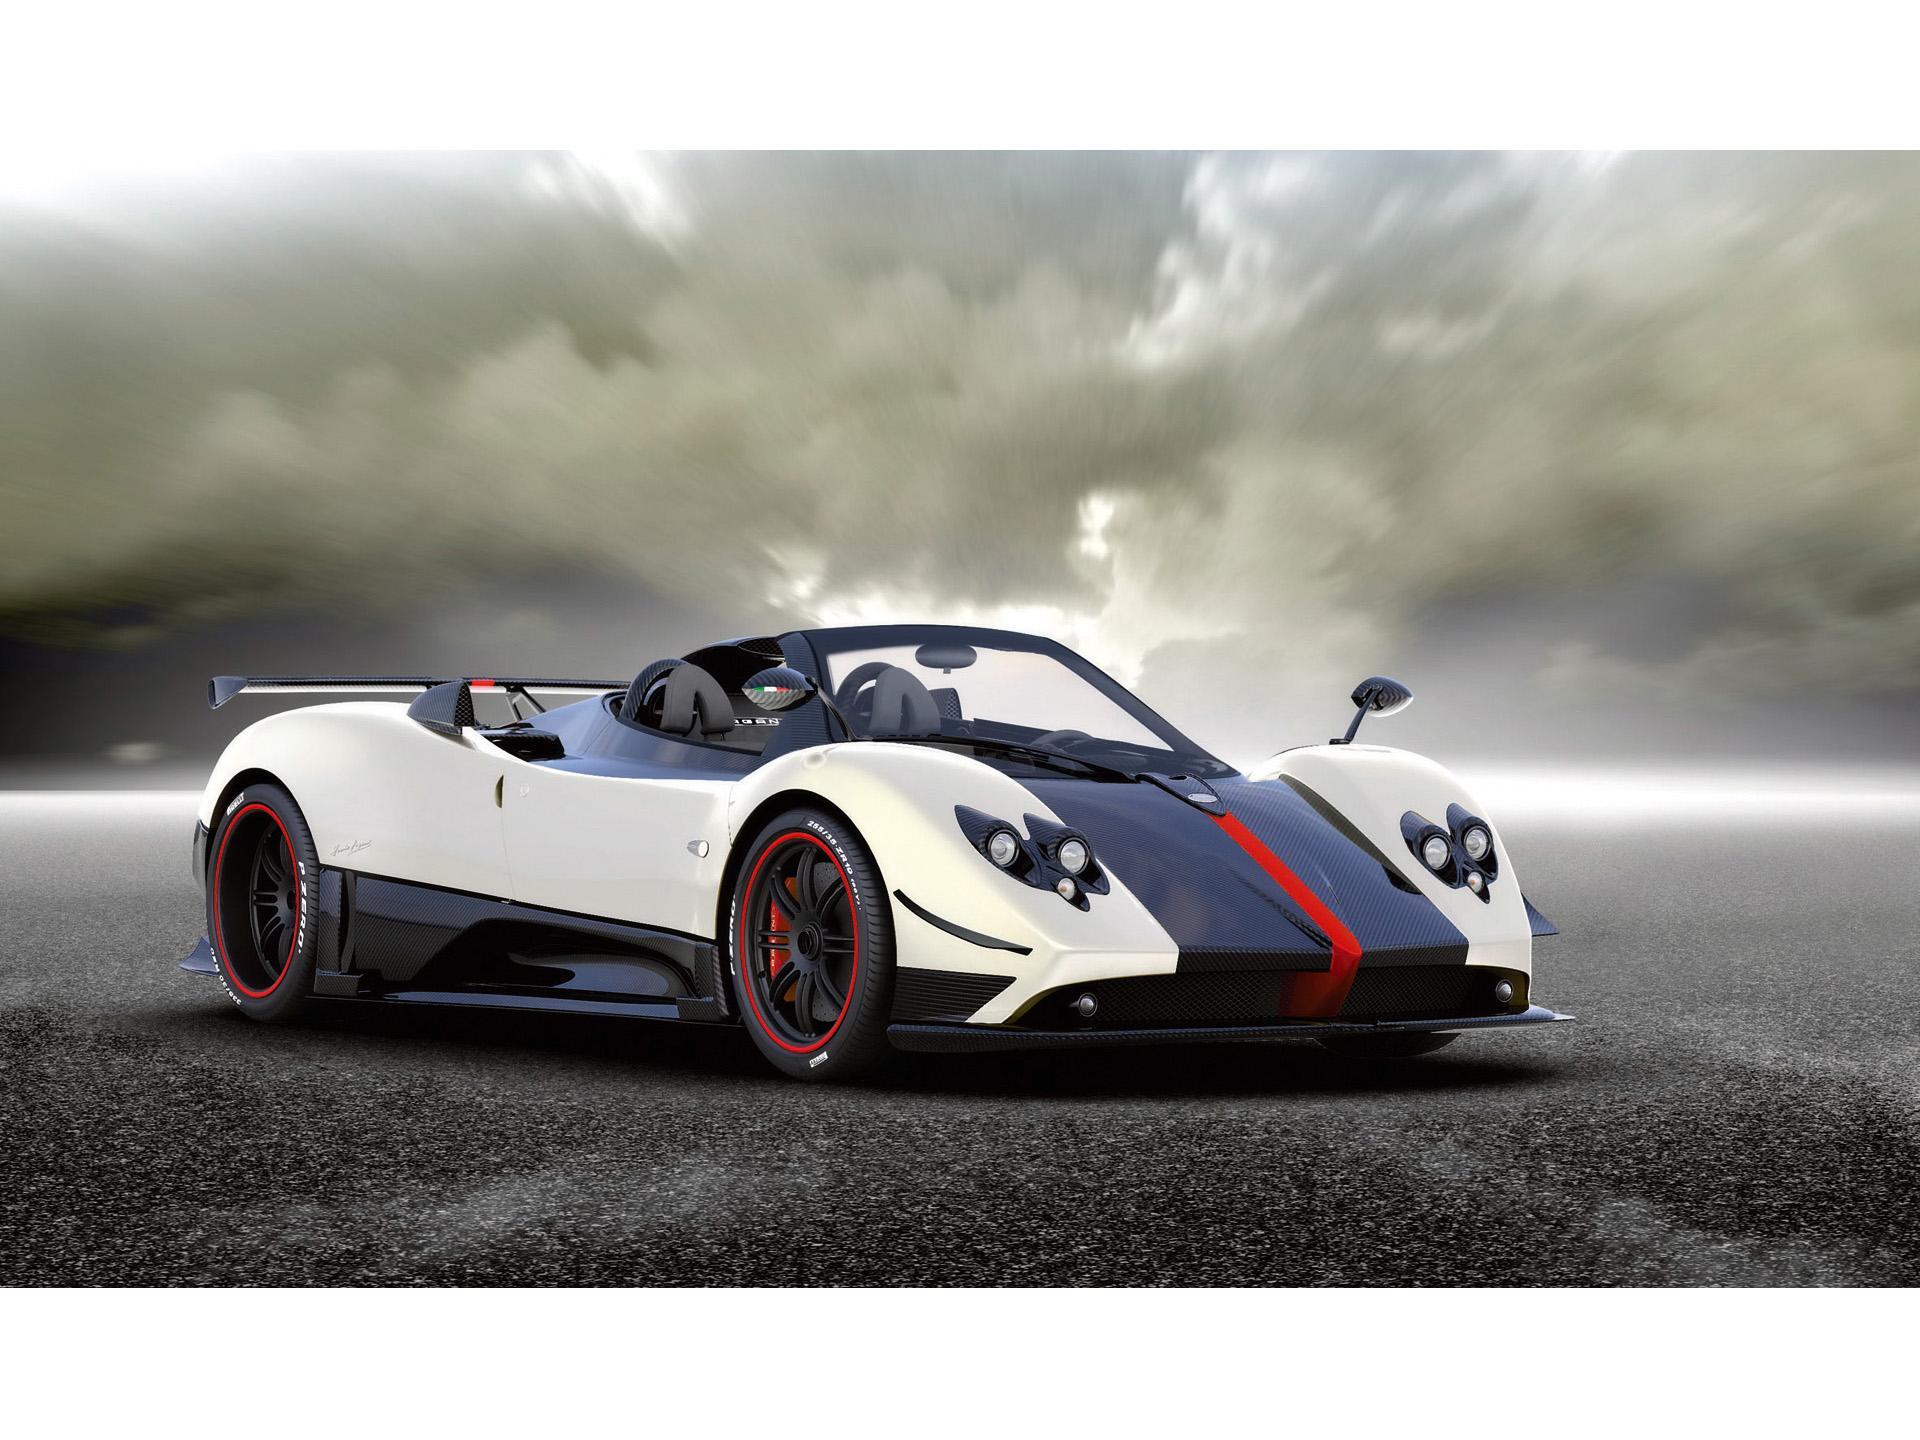 Awesome Race Car Wallpapers 2009 Pagani Zonda Cinque Roadster Conceptcarz Com